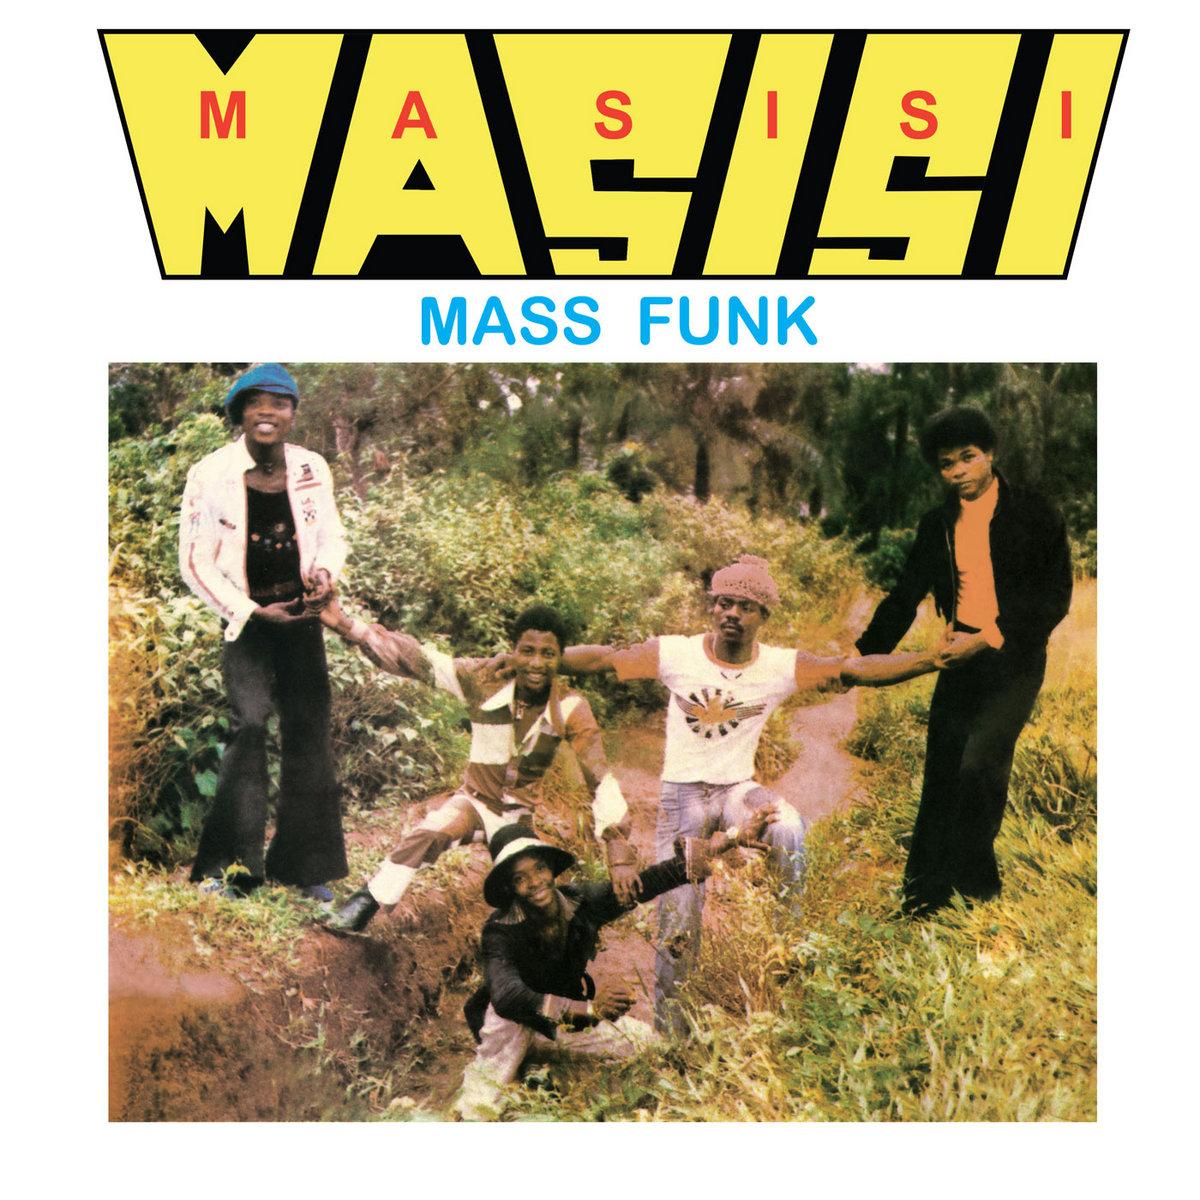 Masisi Mass Funk - I Want You Girl [LP]